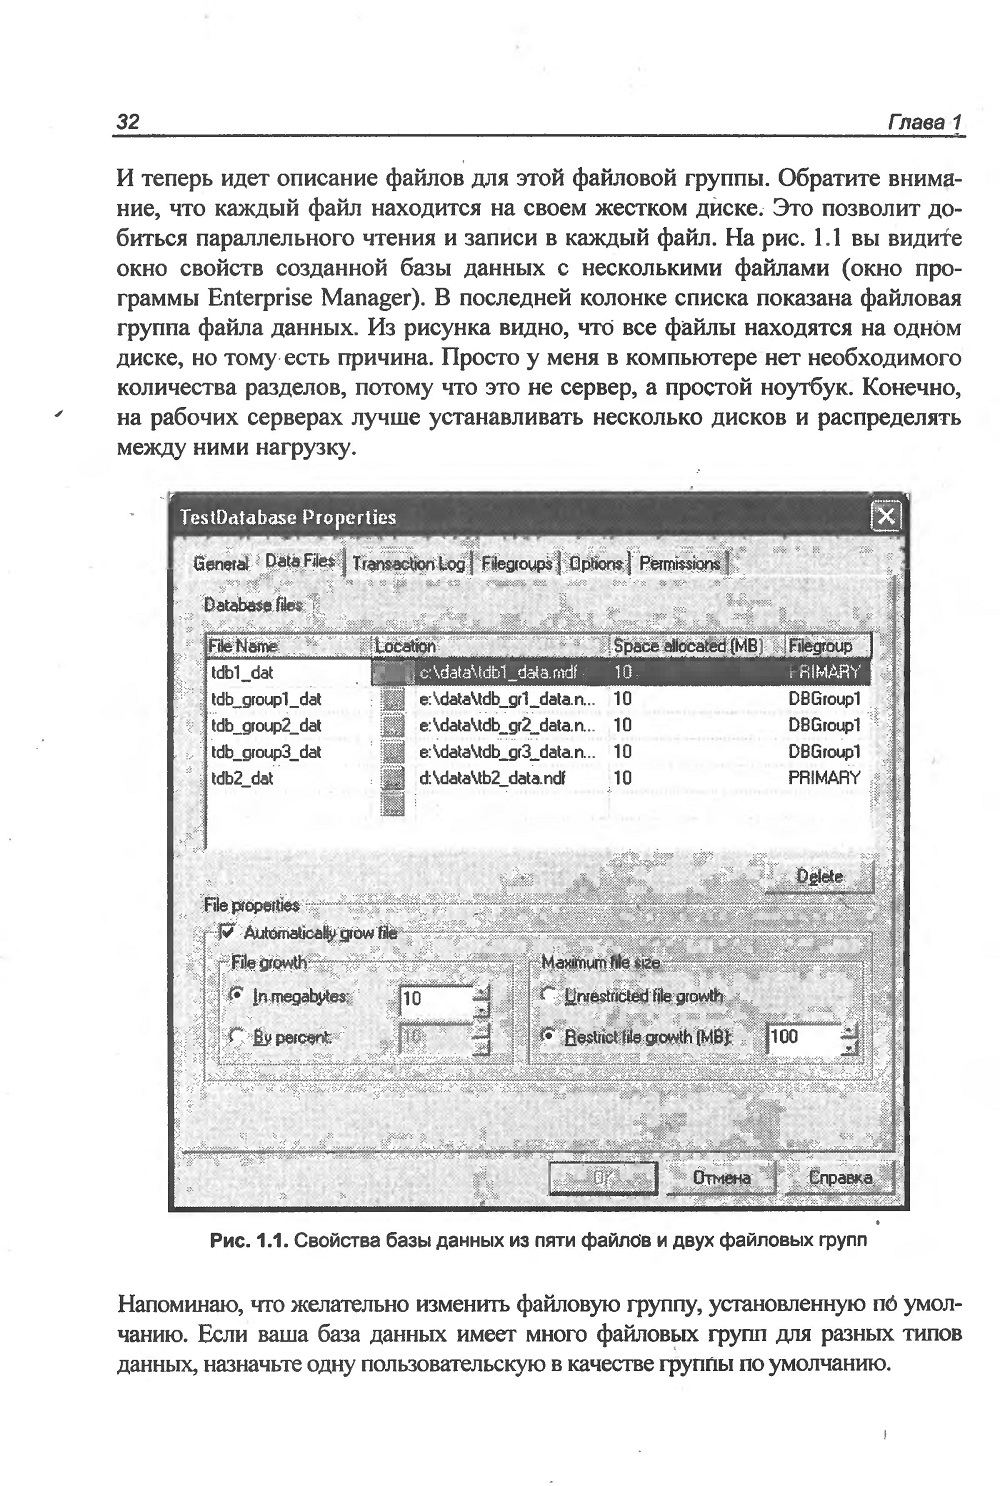 http://i5.imageban.ru/out/2014/01/20/aa9a56cfba699f94385e0a8b4b621798.jpg